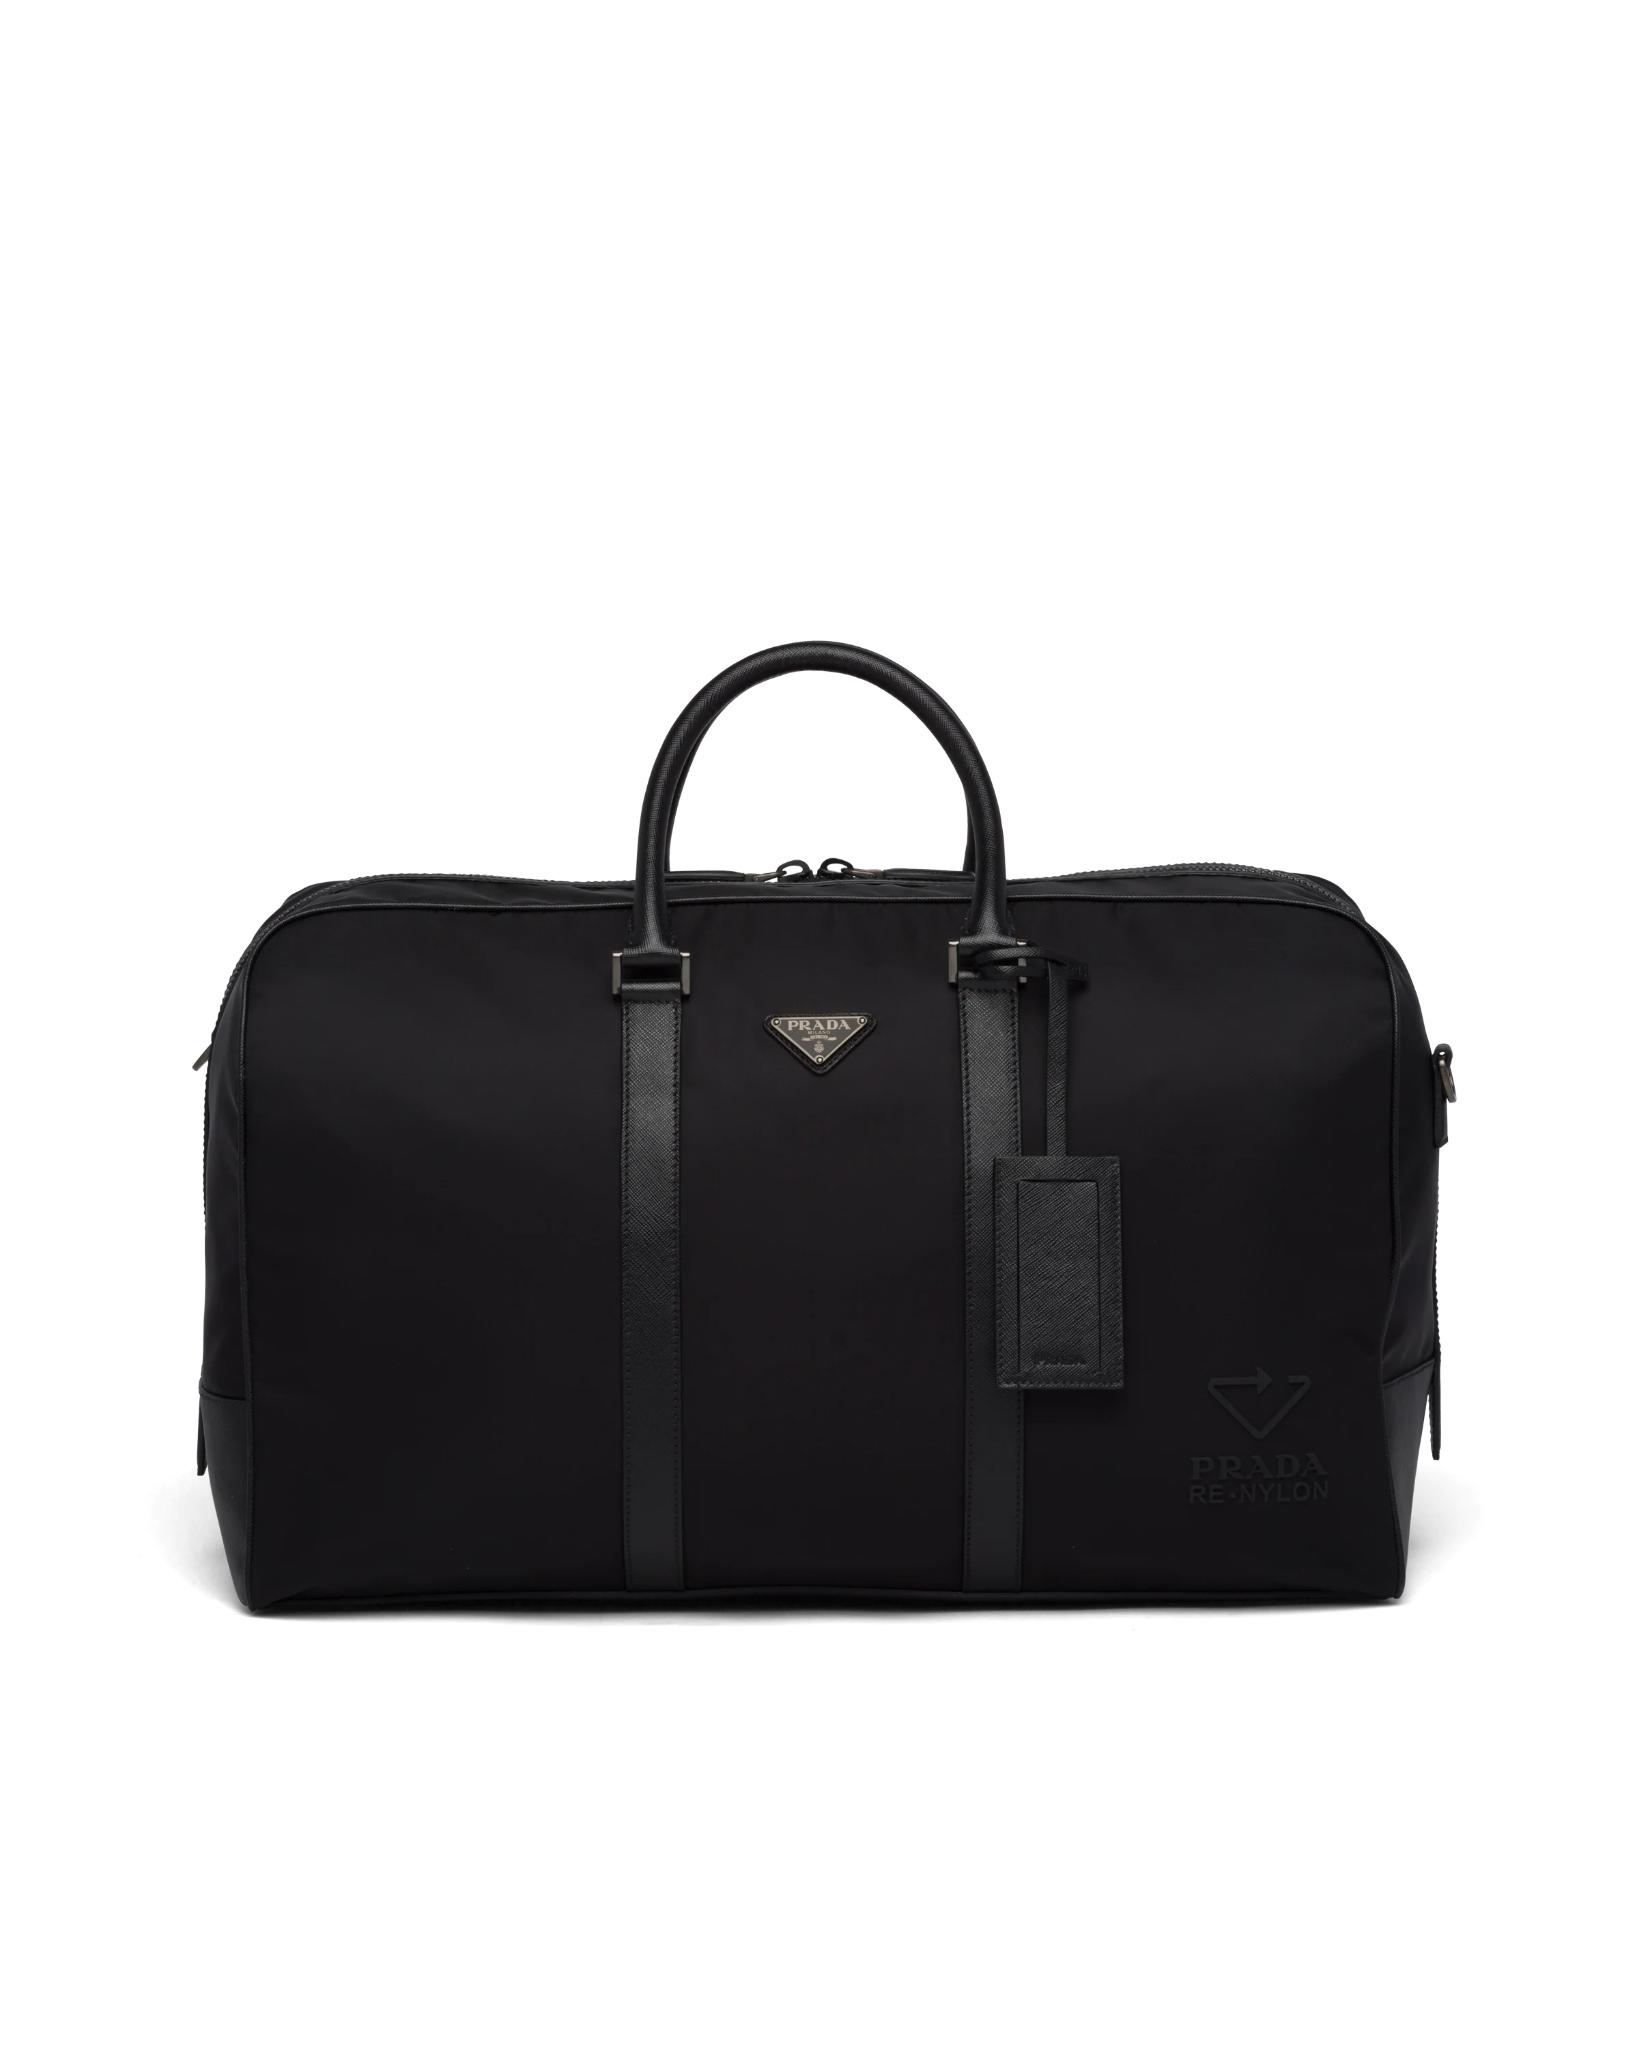 3. PRADA : Re-Nylon and Saffiano leather travel bag